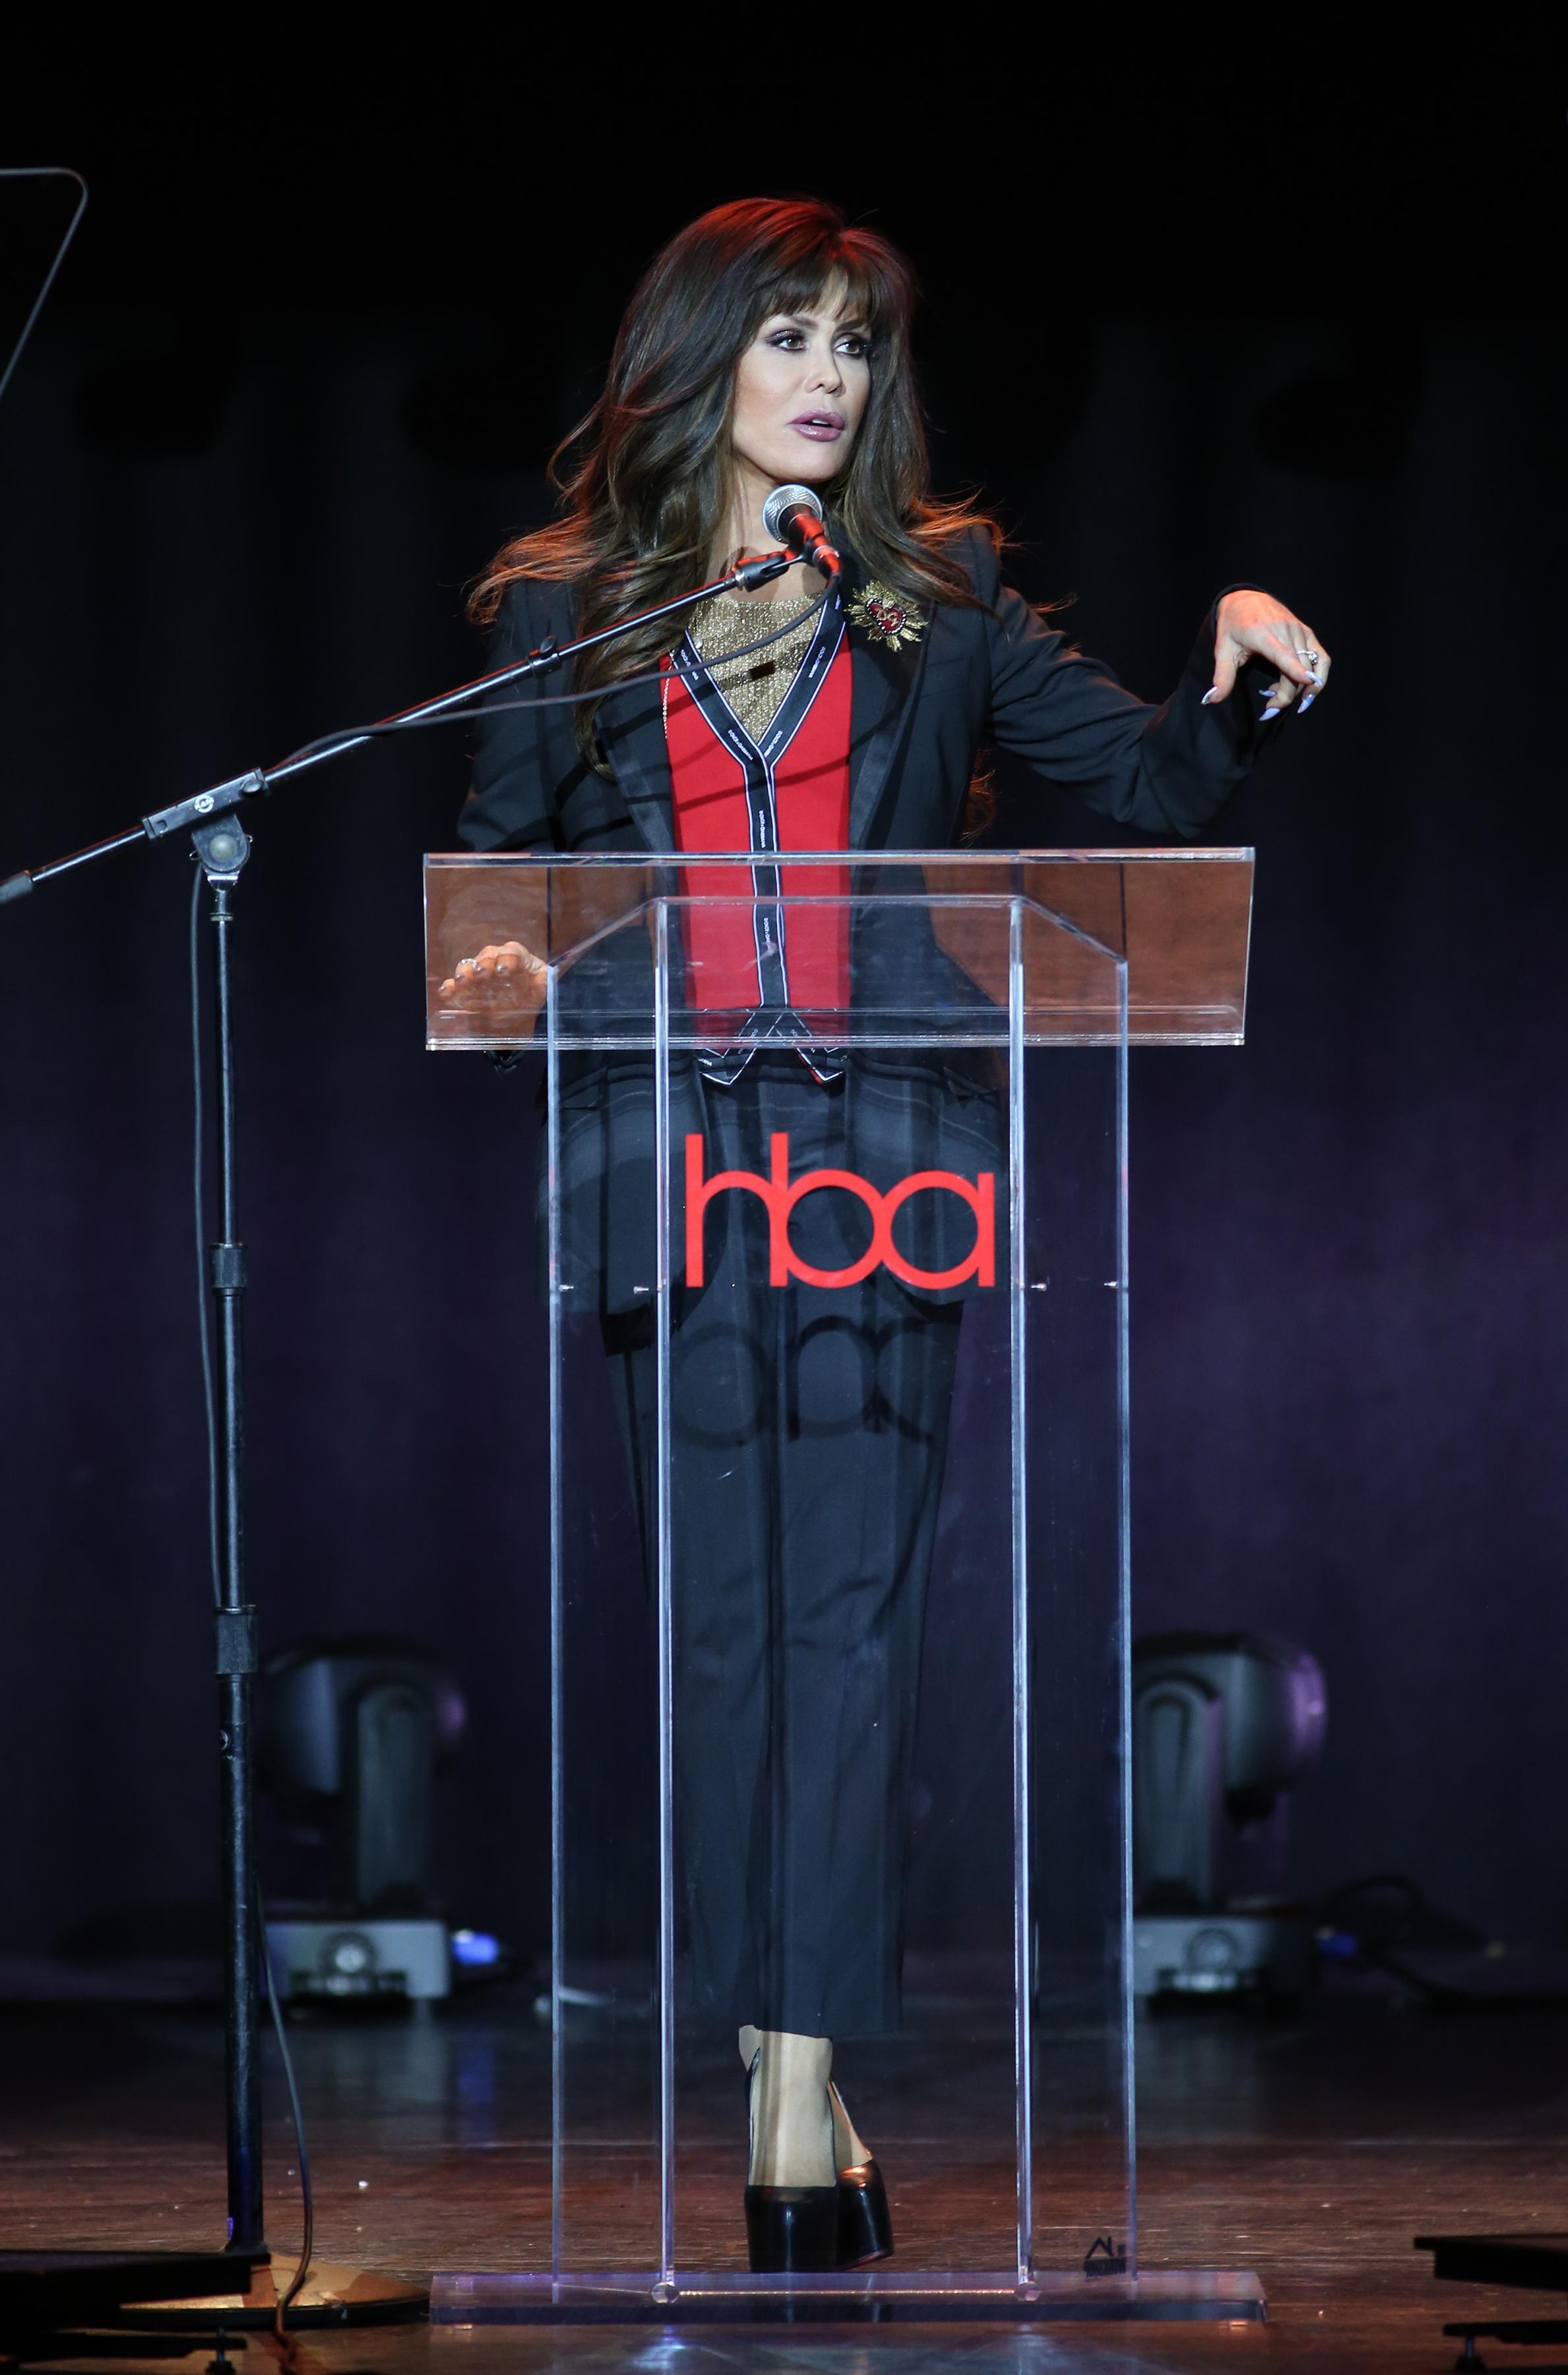 Marie Osmond | Feb 25, 2018, Hollywood Beauty Awards held at the Avalon